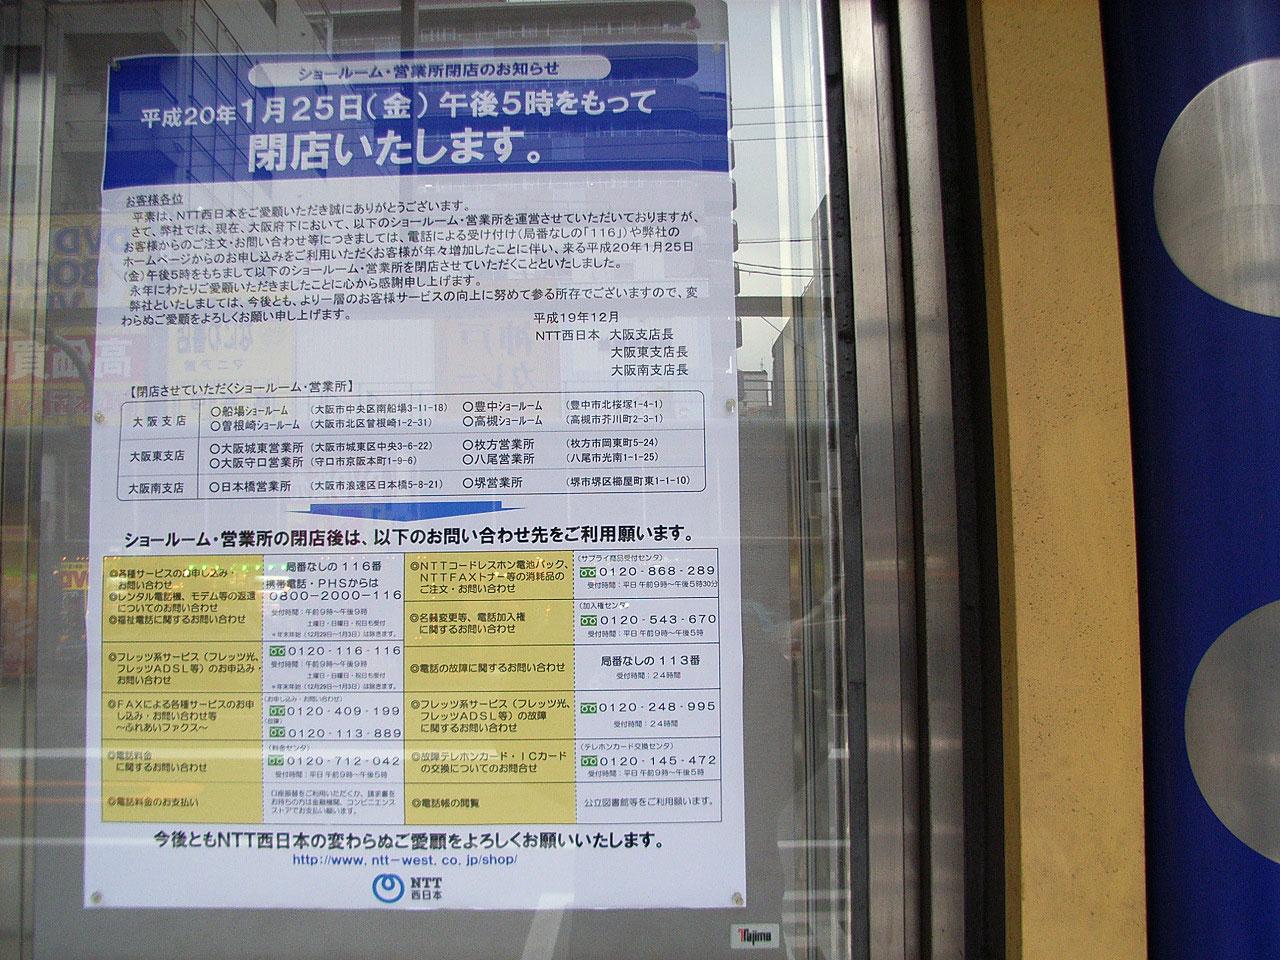 NTT西日本、日本橋営業所を来年1月で閉鎖